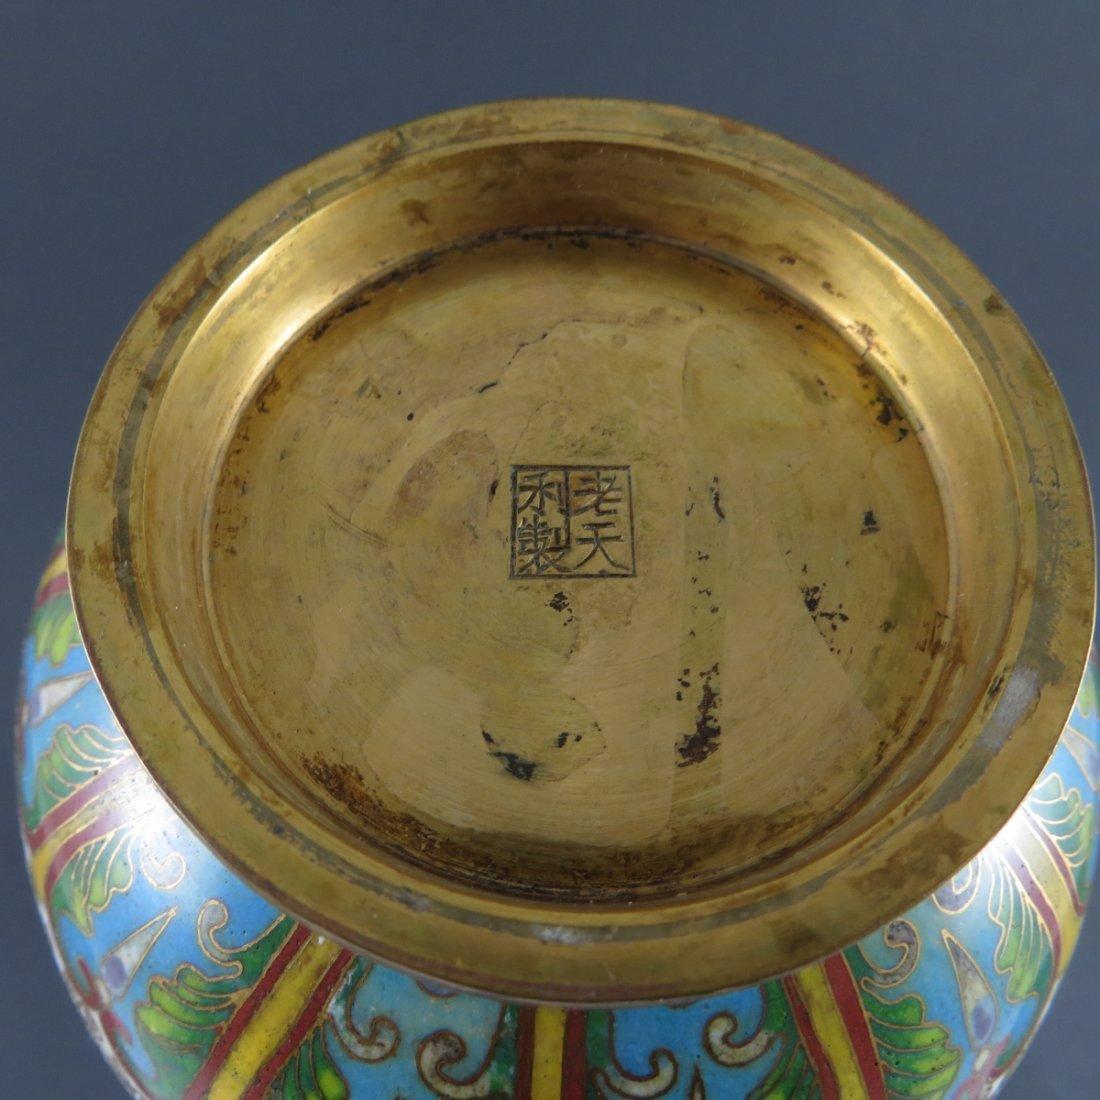 Chinese Qing Dynasty Cloisonne Vase - 3